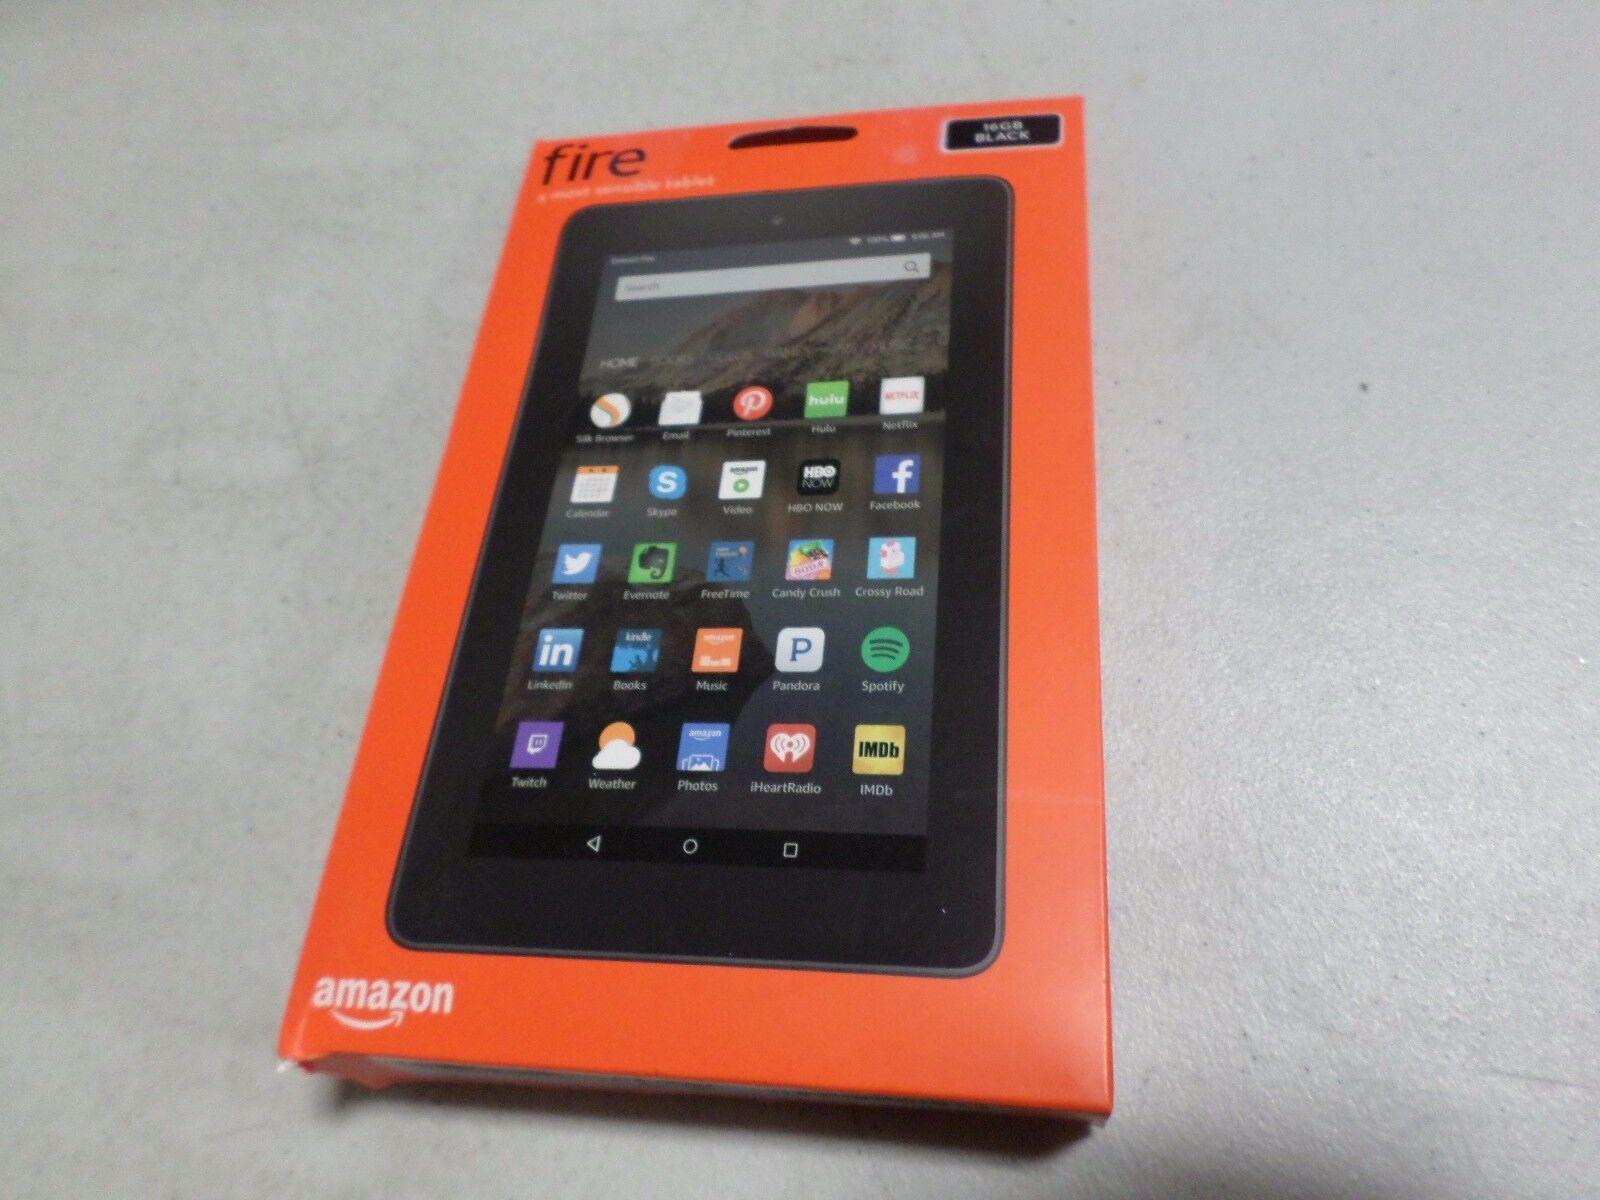 Amazon Fire Tablet 5th Generation 16GB, Wi-Fi, 7in - Black